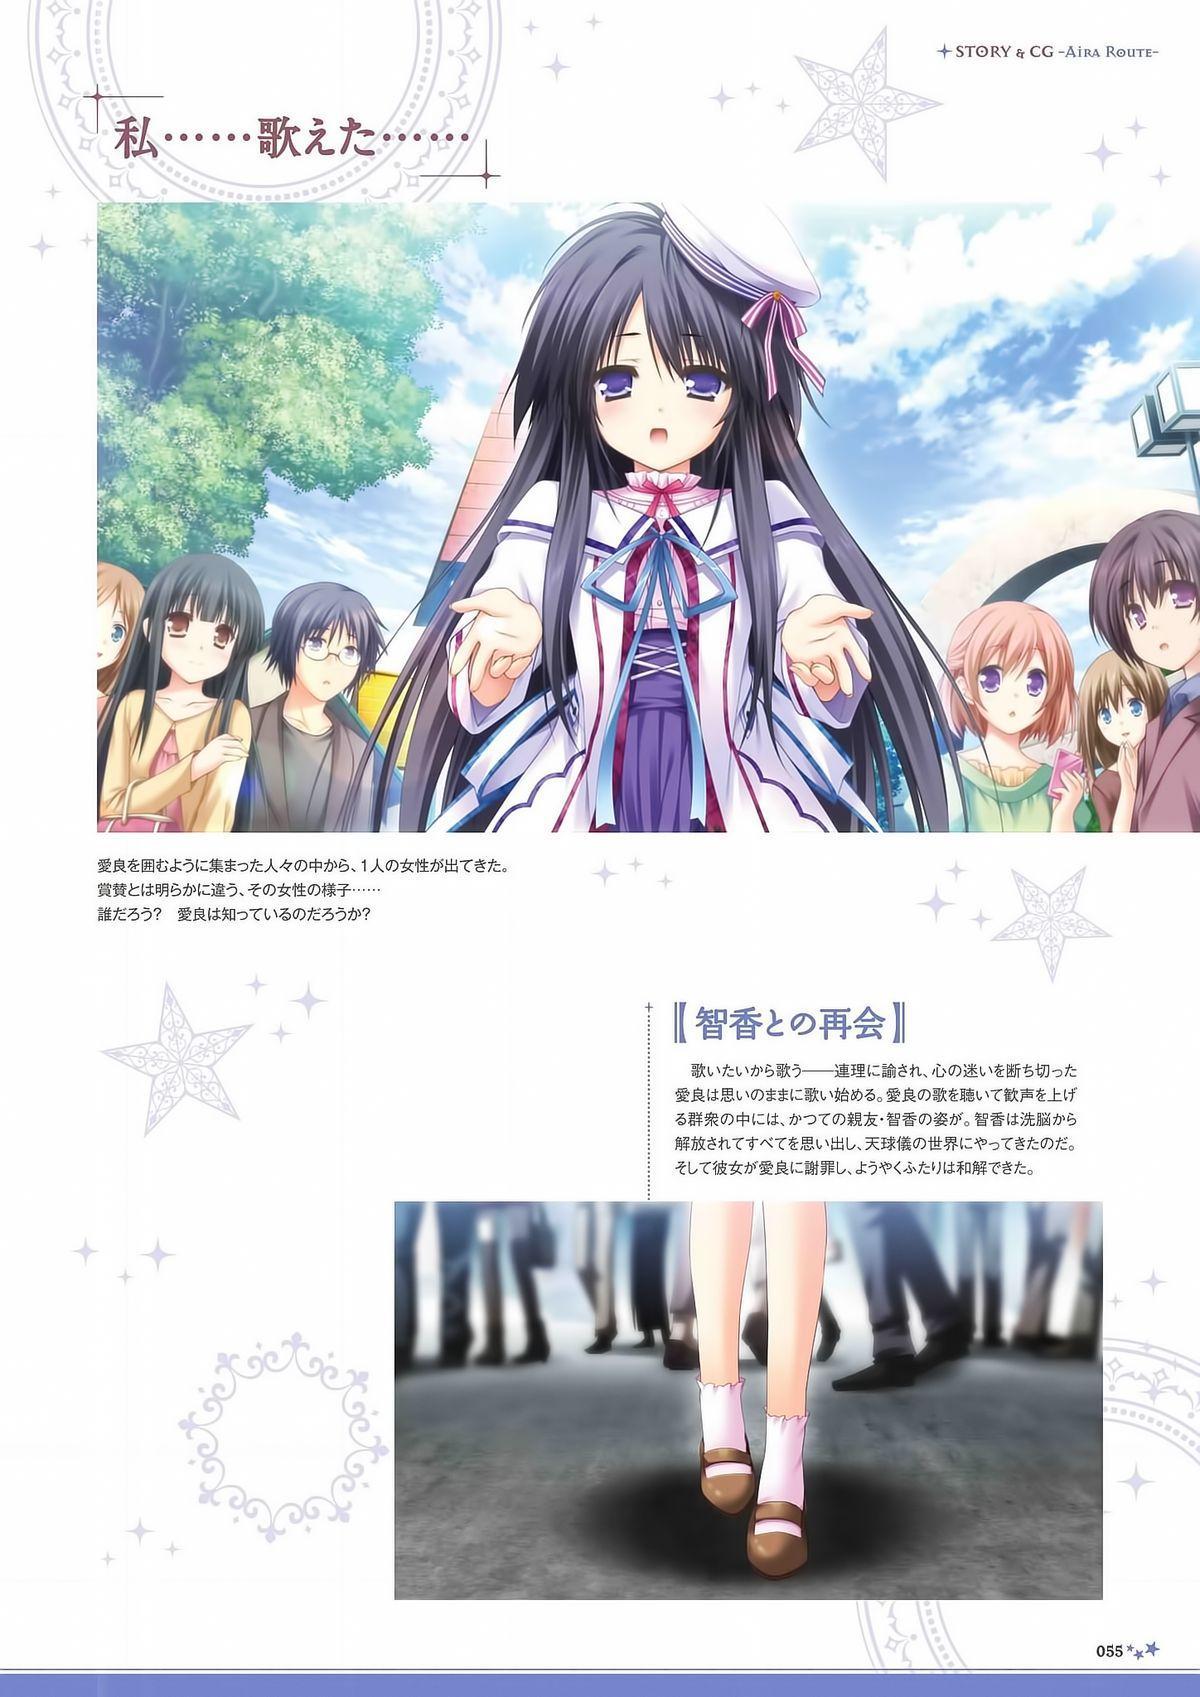 Sekai to Sekai no Mannaka de Visual Fanbook 56